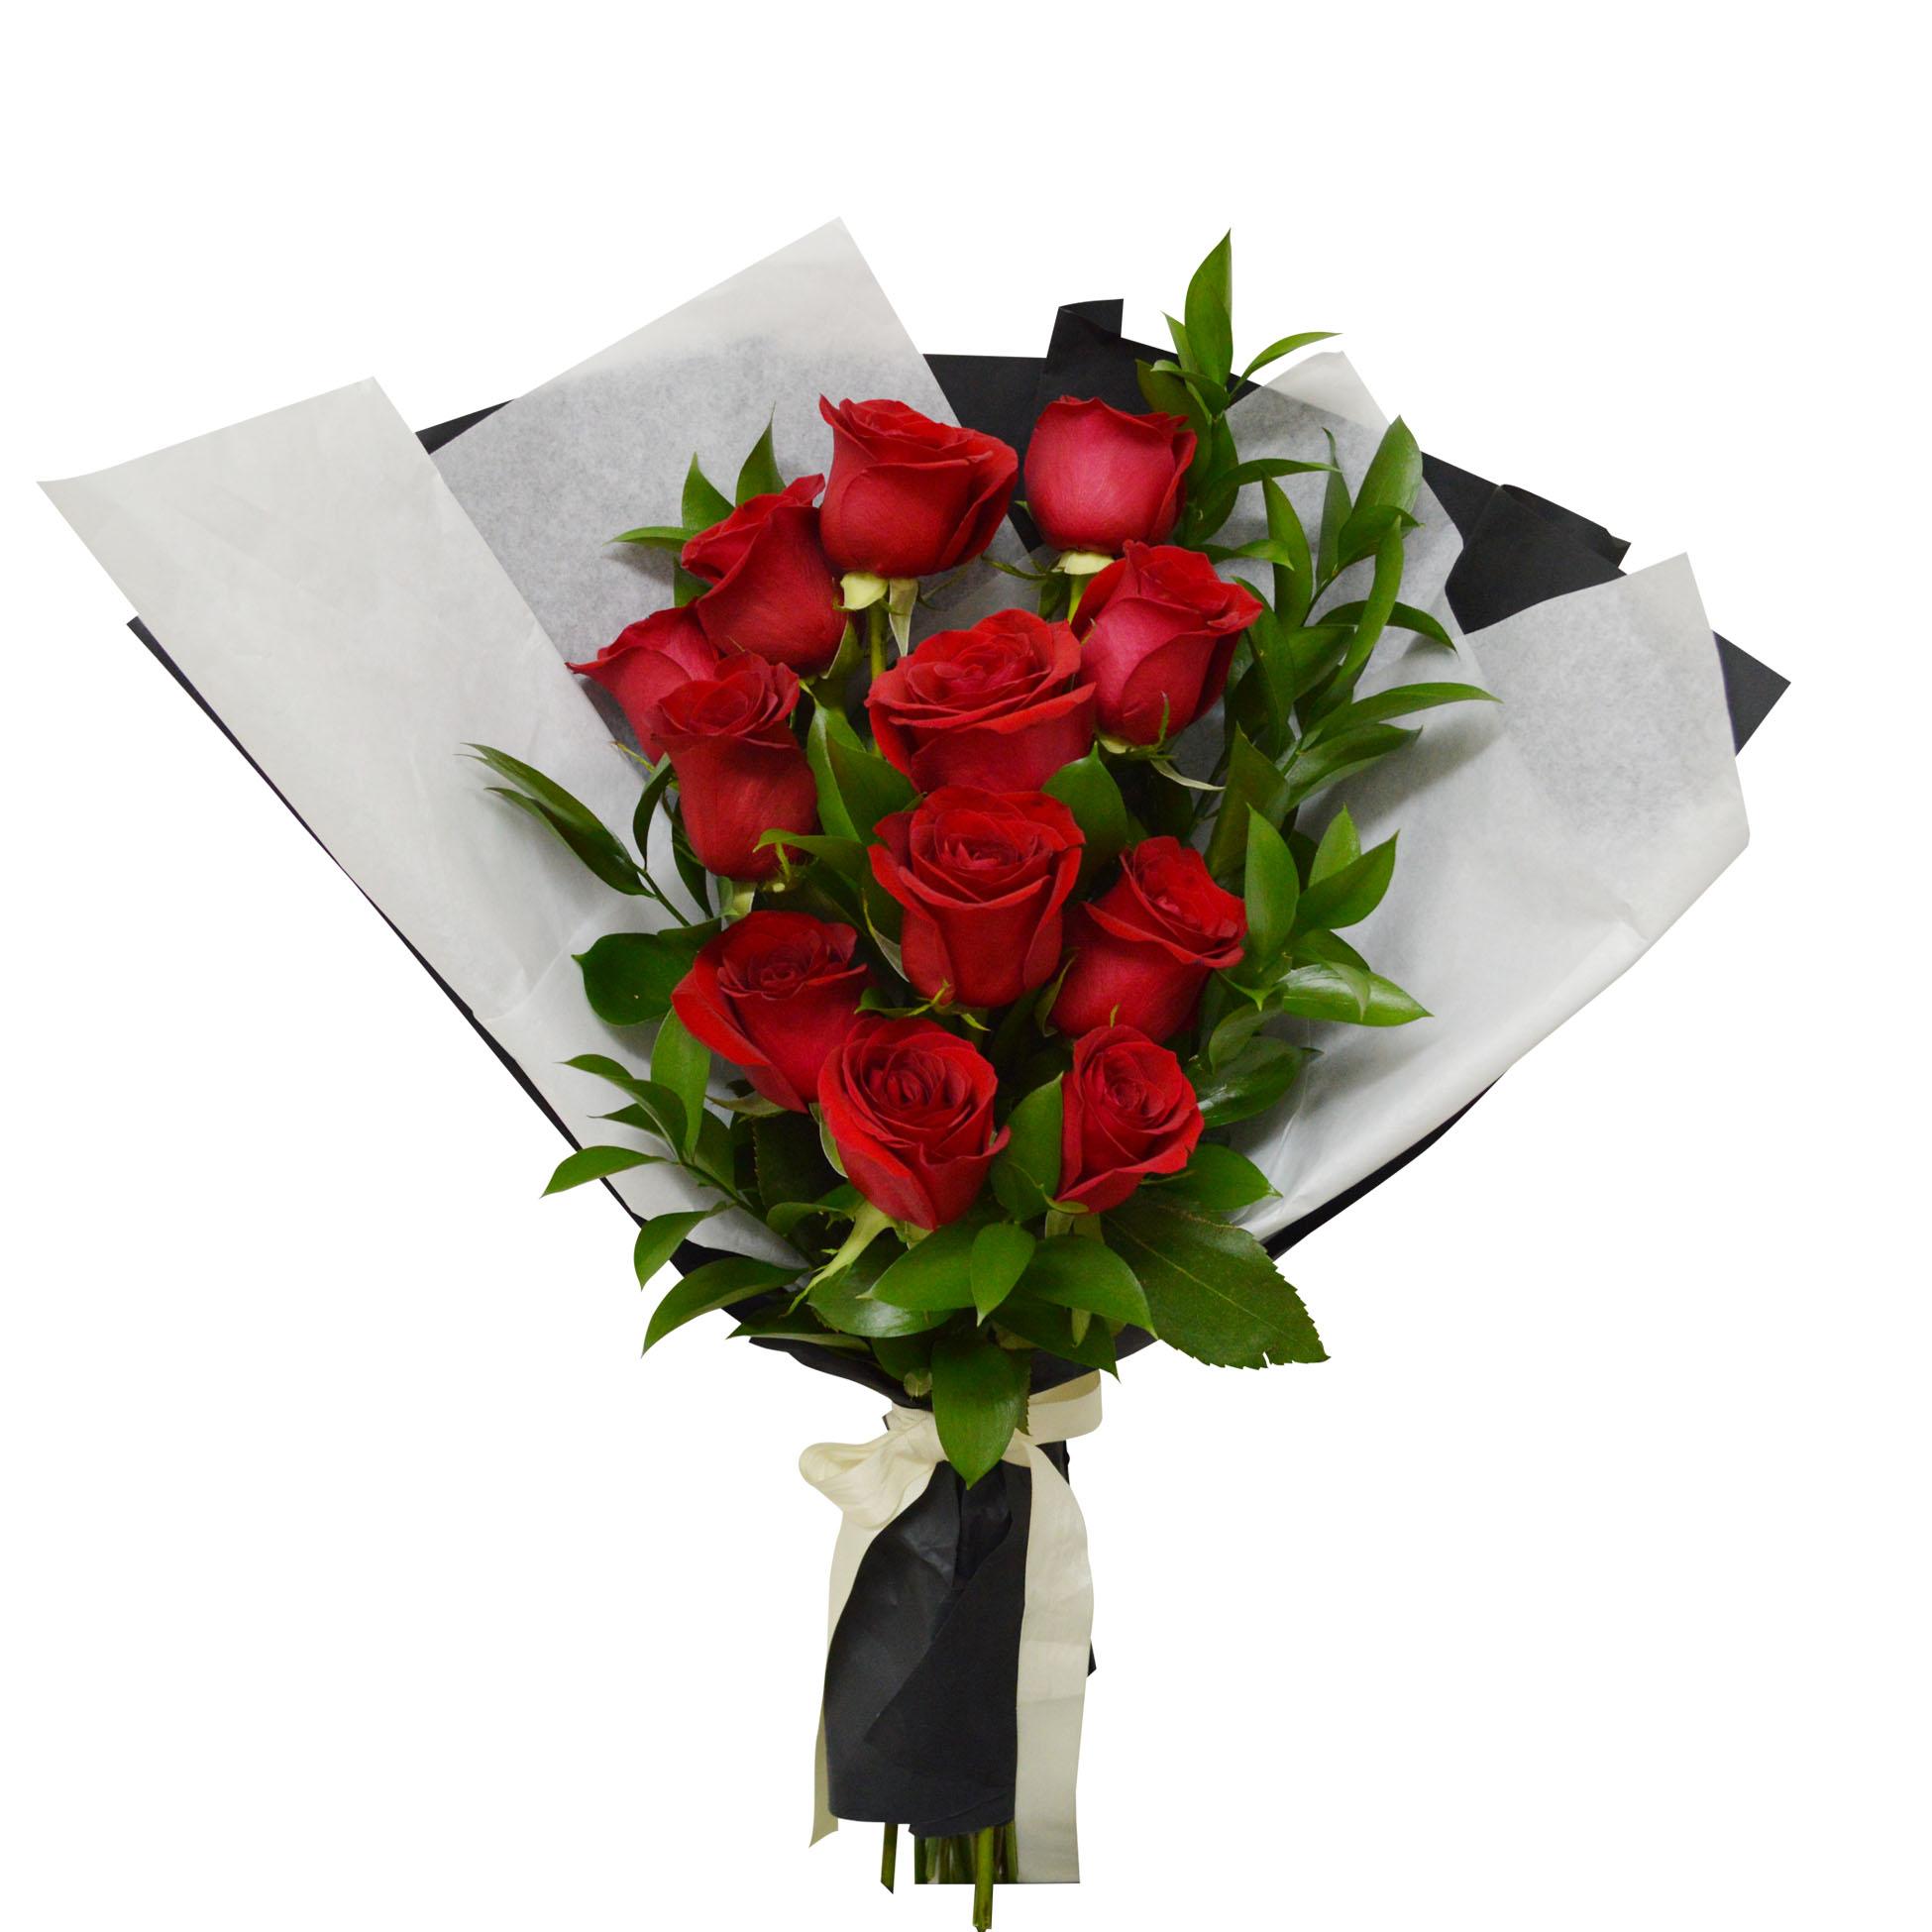 Ramo de 12 Rosas de color Rojo mas Ruscus